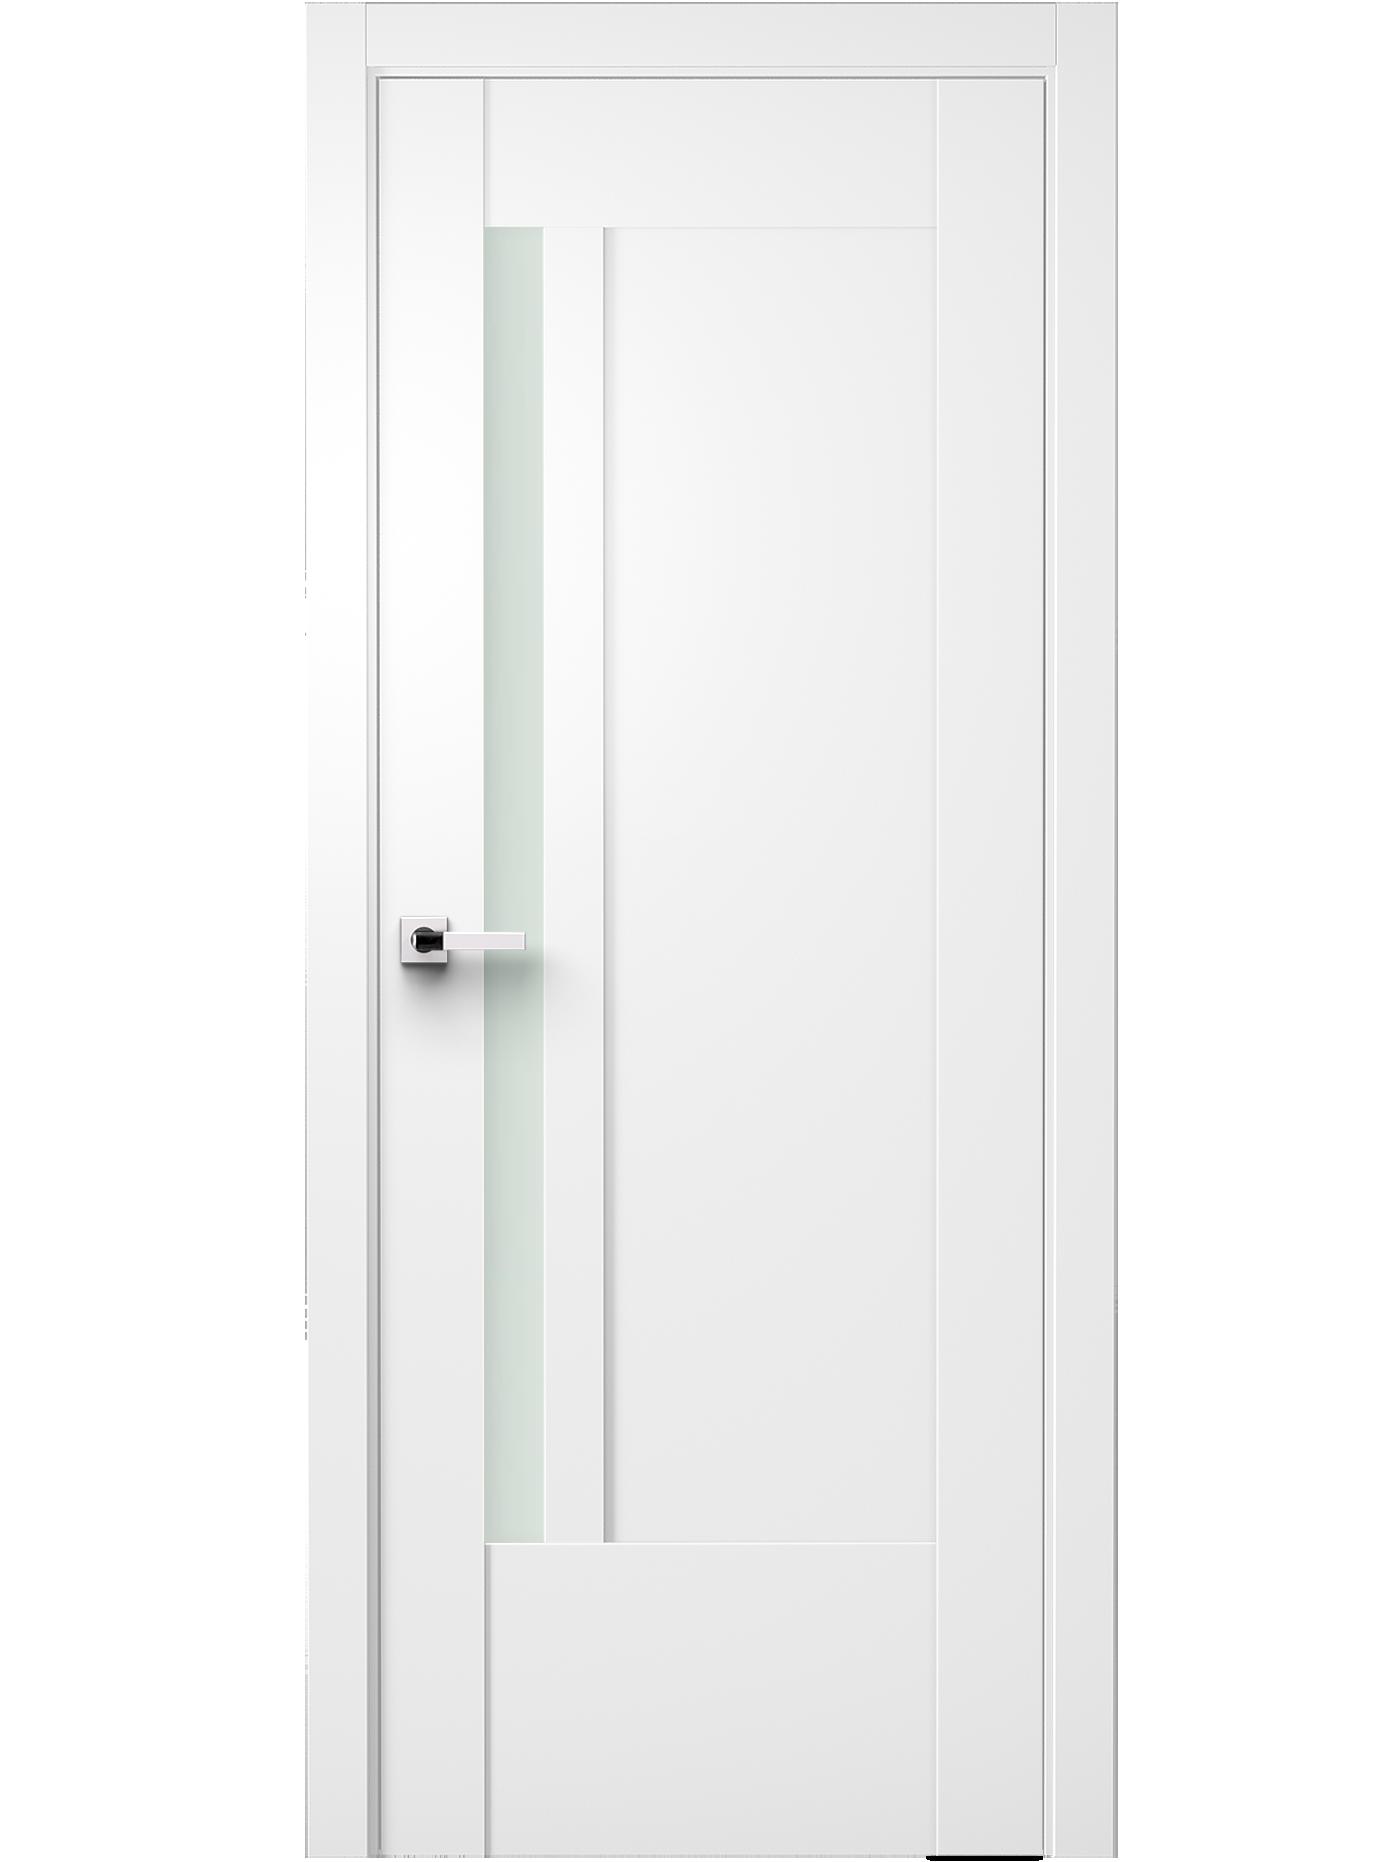 Image Fidela Interior Door Soft Touch White 0